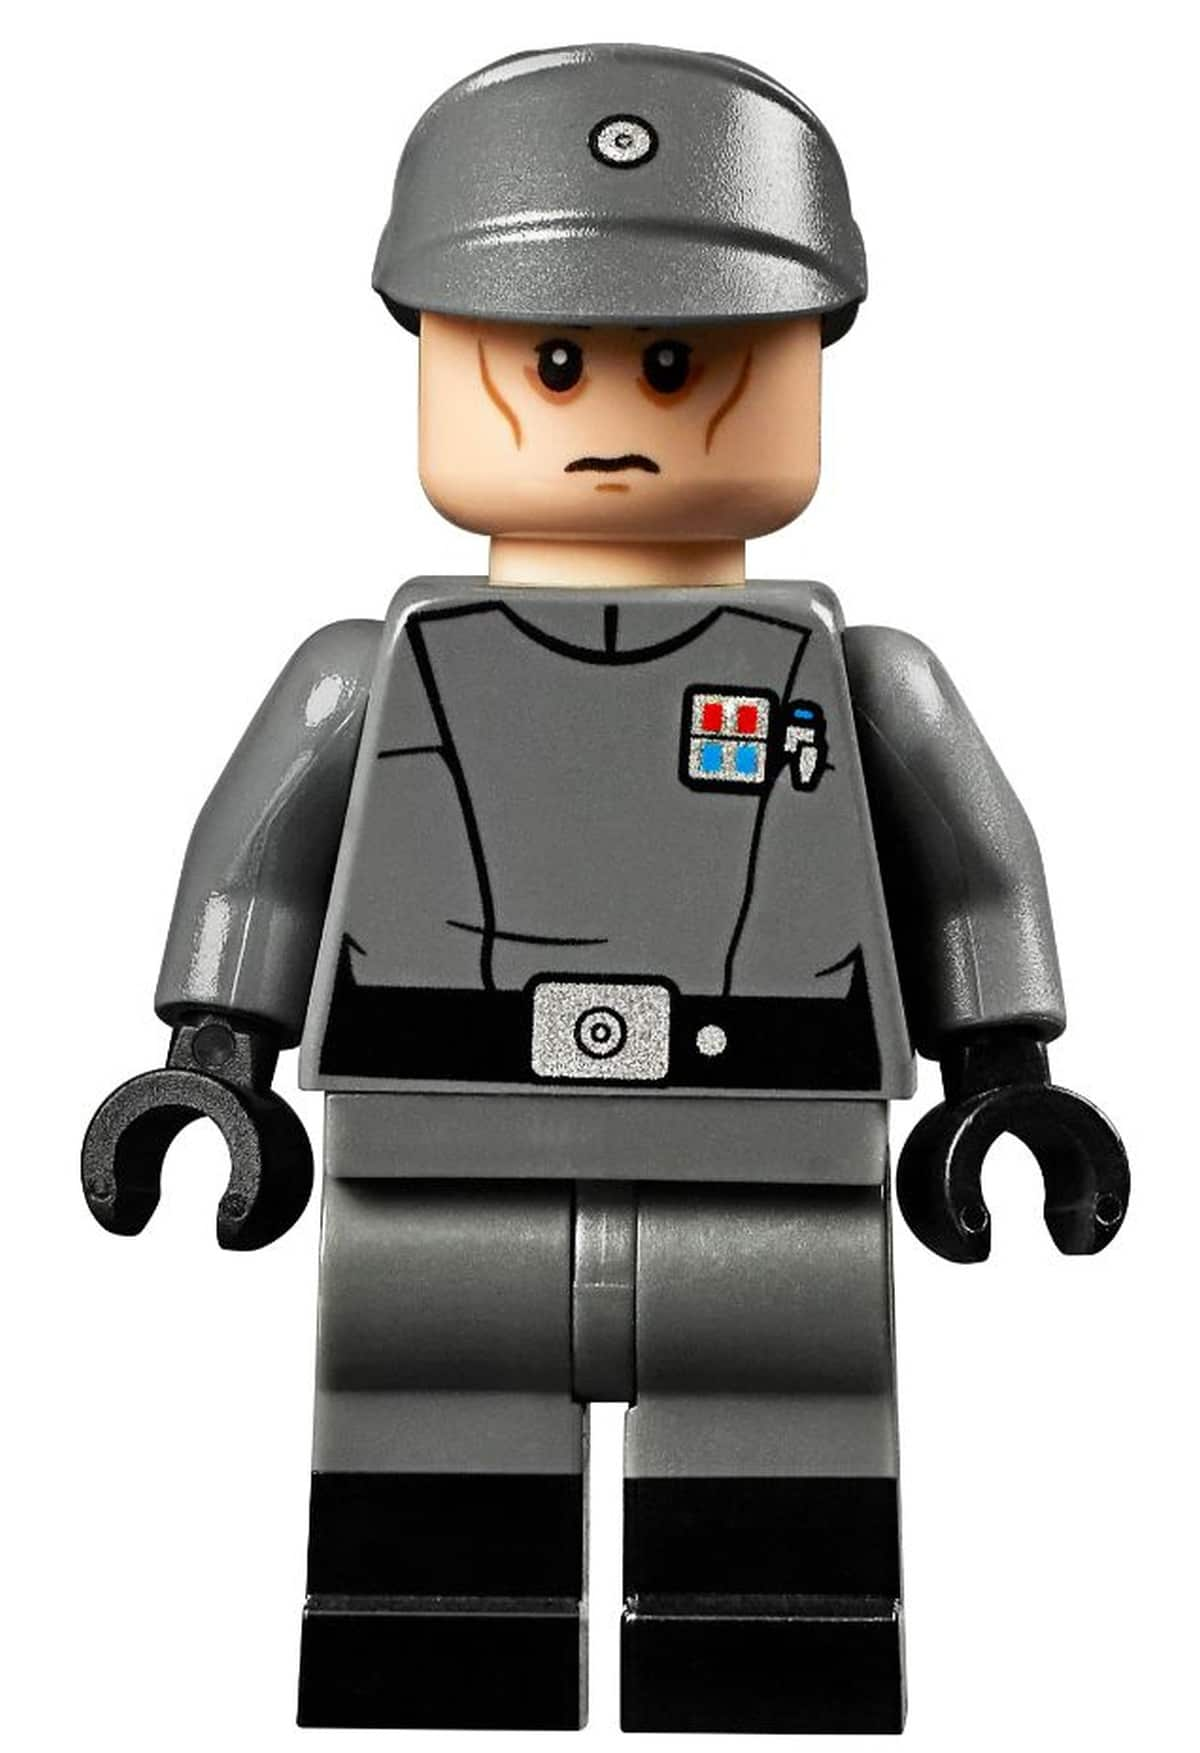 lego-star-wars-75252-ucs-isd-2019-0030.jpg